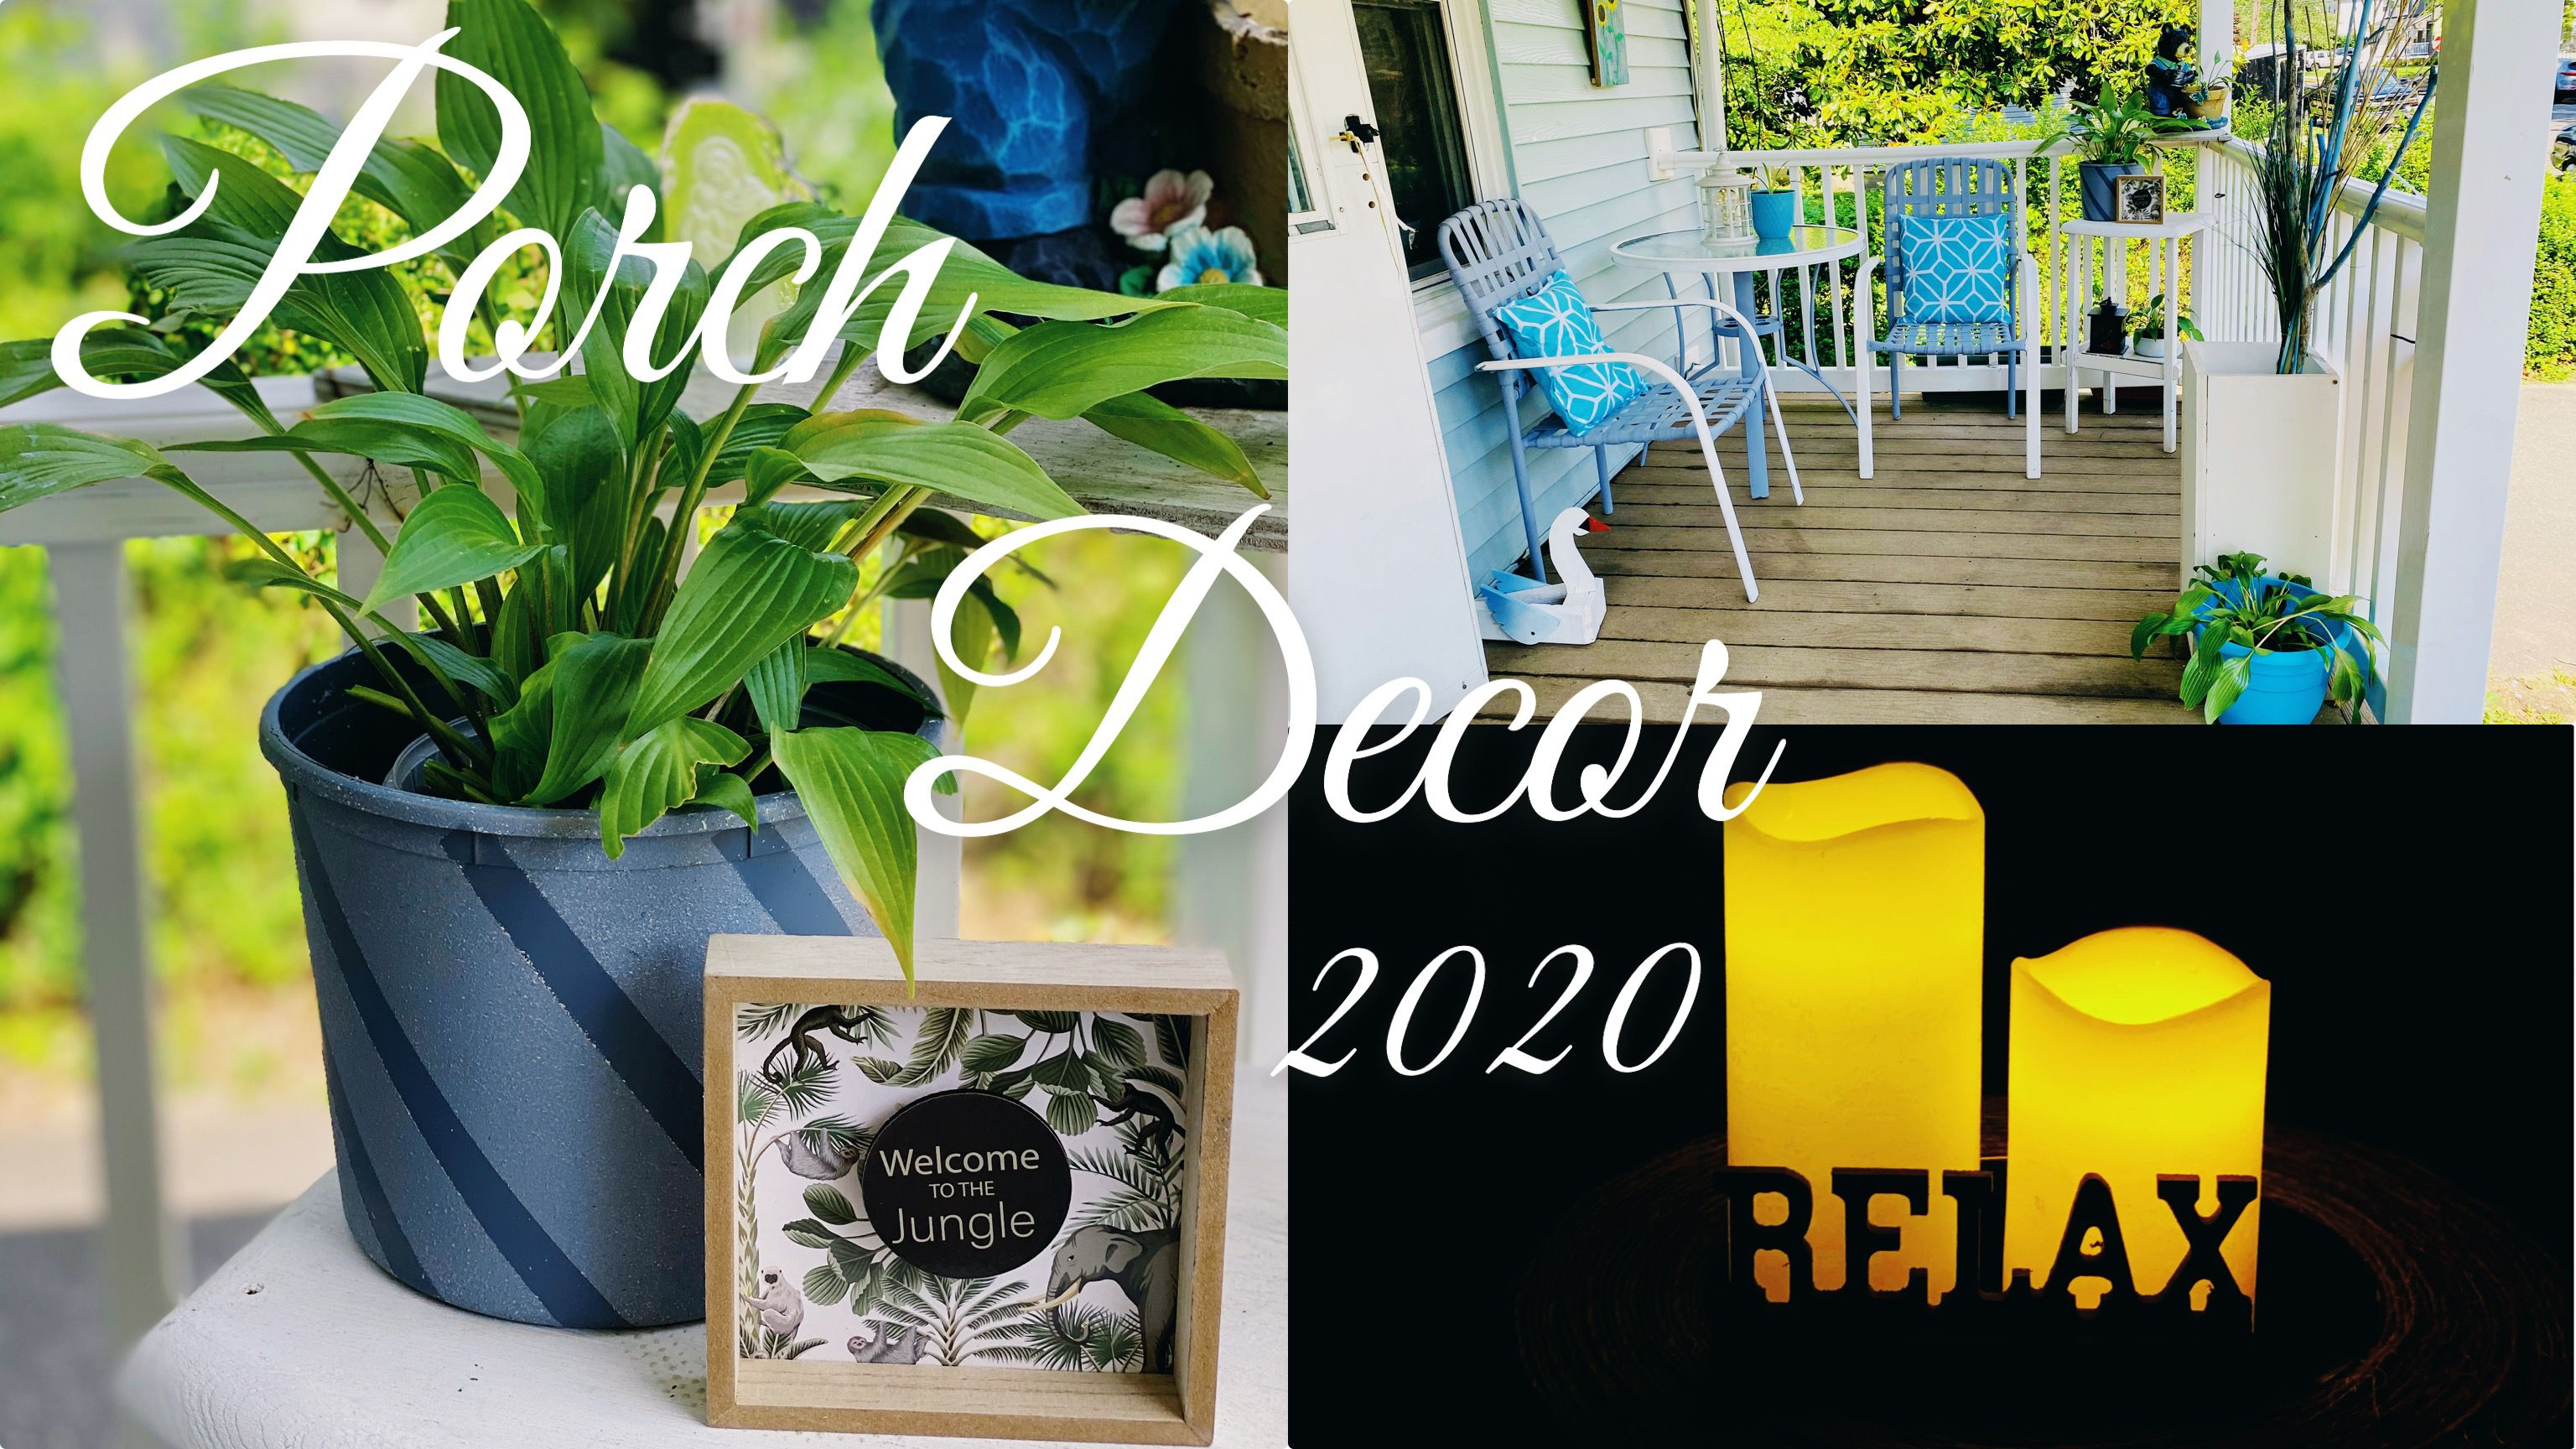 Porch  Decor #porch #porchdecor #porchdecorating  #summerdecor #patioideas #lavidaconyesi